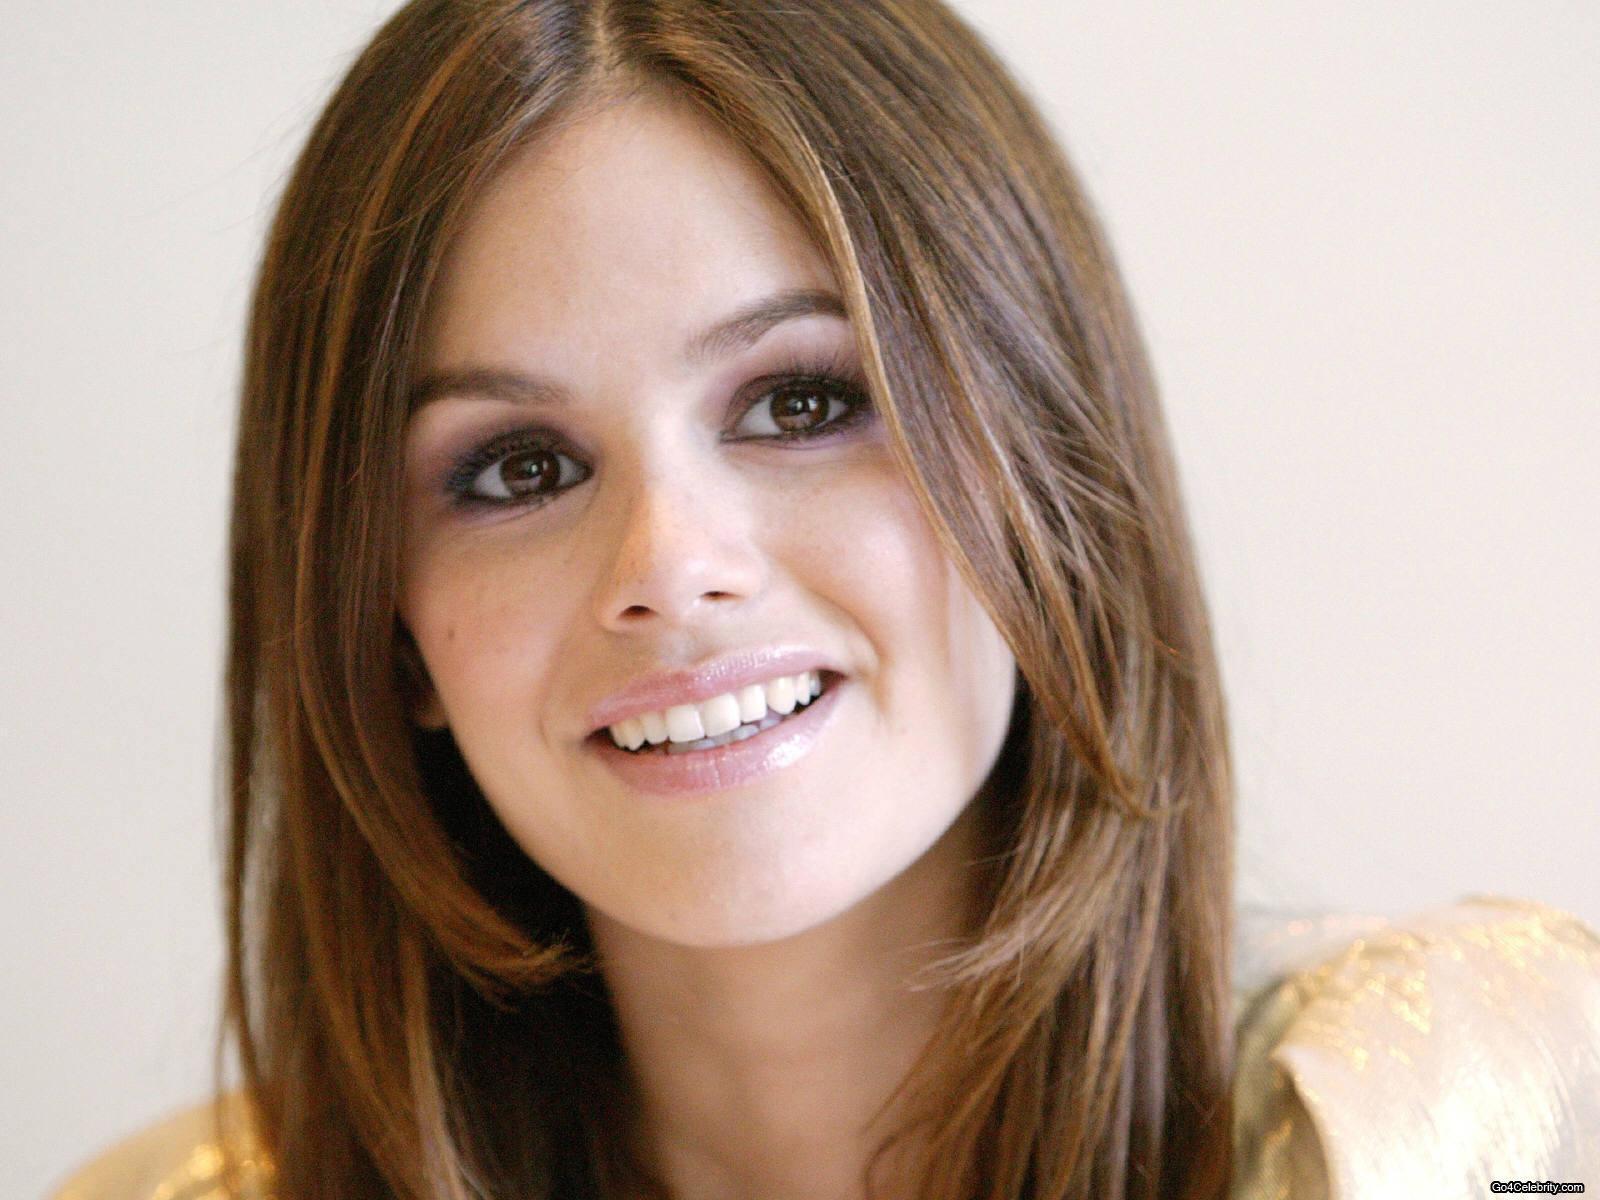 http://3.bp.blogspot.com/-iuNLv8bTZvk/TbQmj6-dMrI/AAAAAAAAAGI/IYVshrvRJl0/s1600/Rachel%2BBilson.jpg